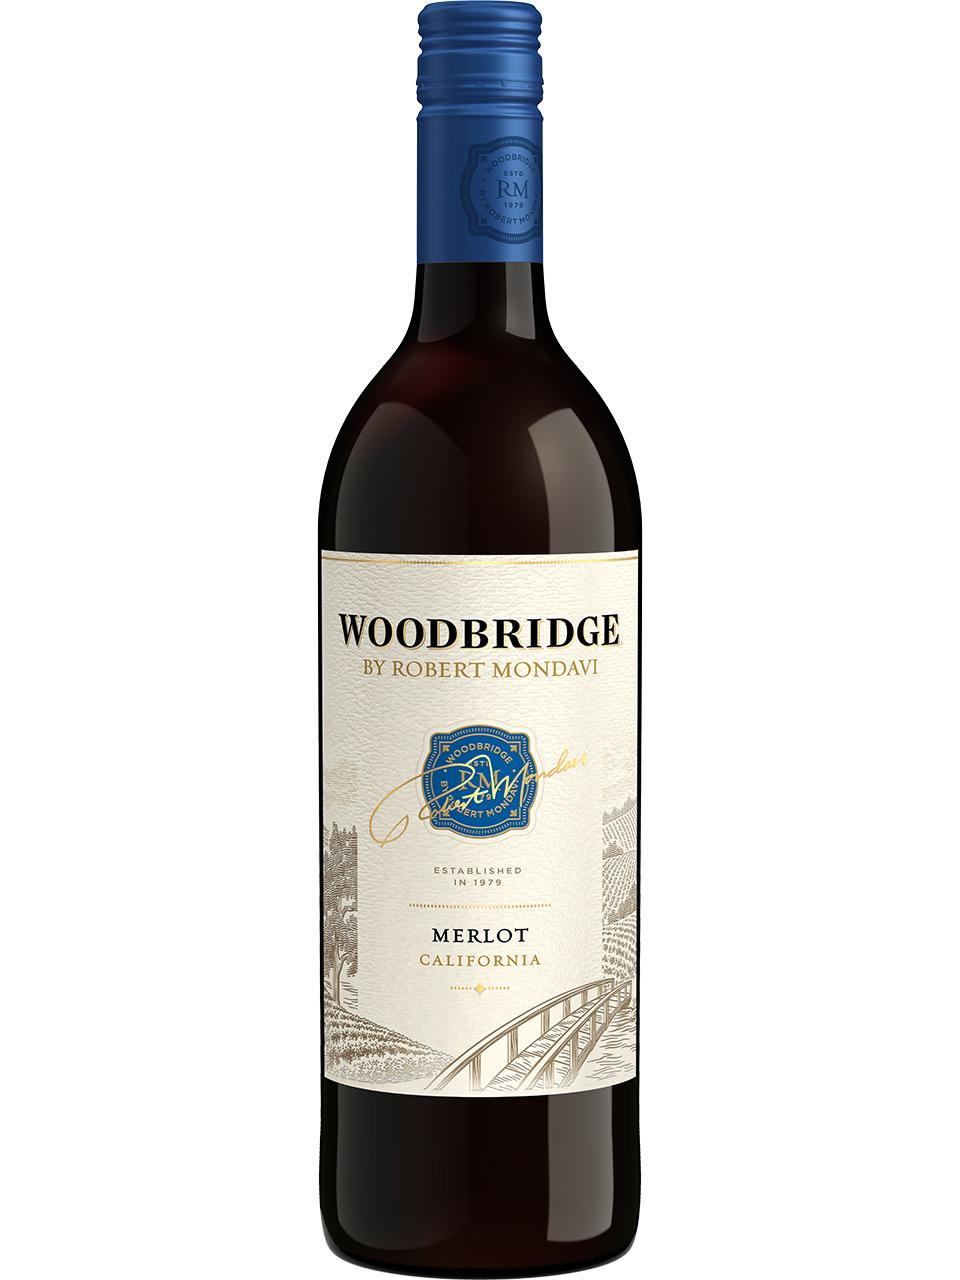 Woodbridge Robert Mondavi Merlot